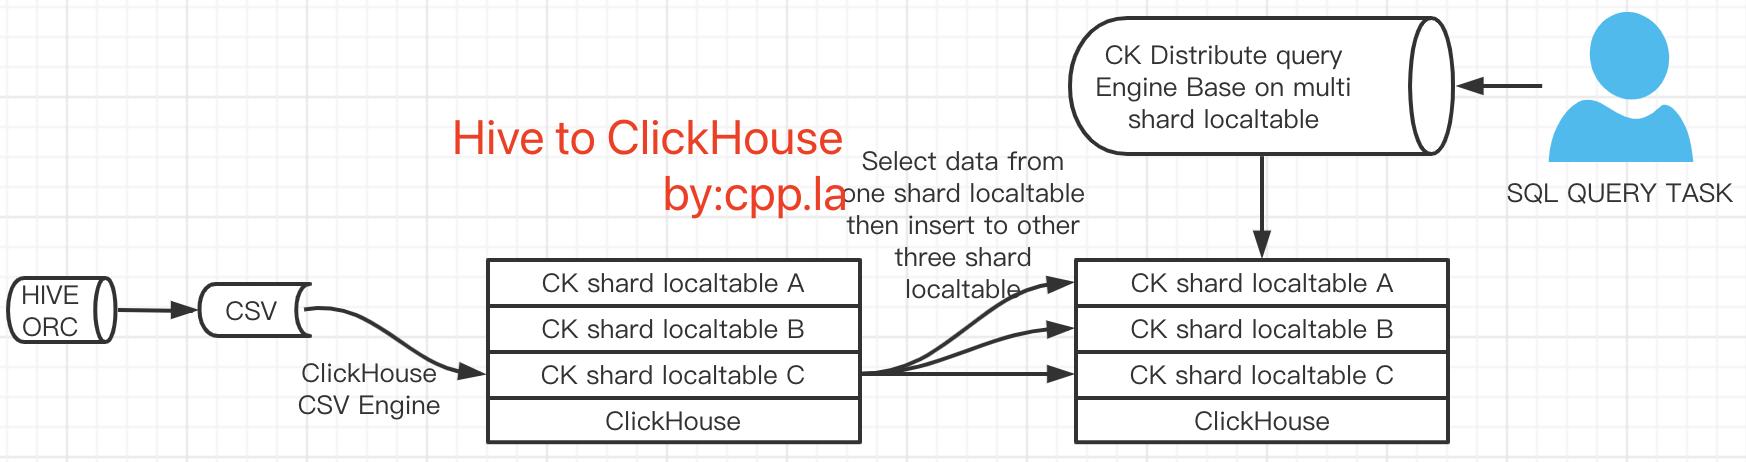 HiveToClickHouse架构方案图二